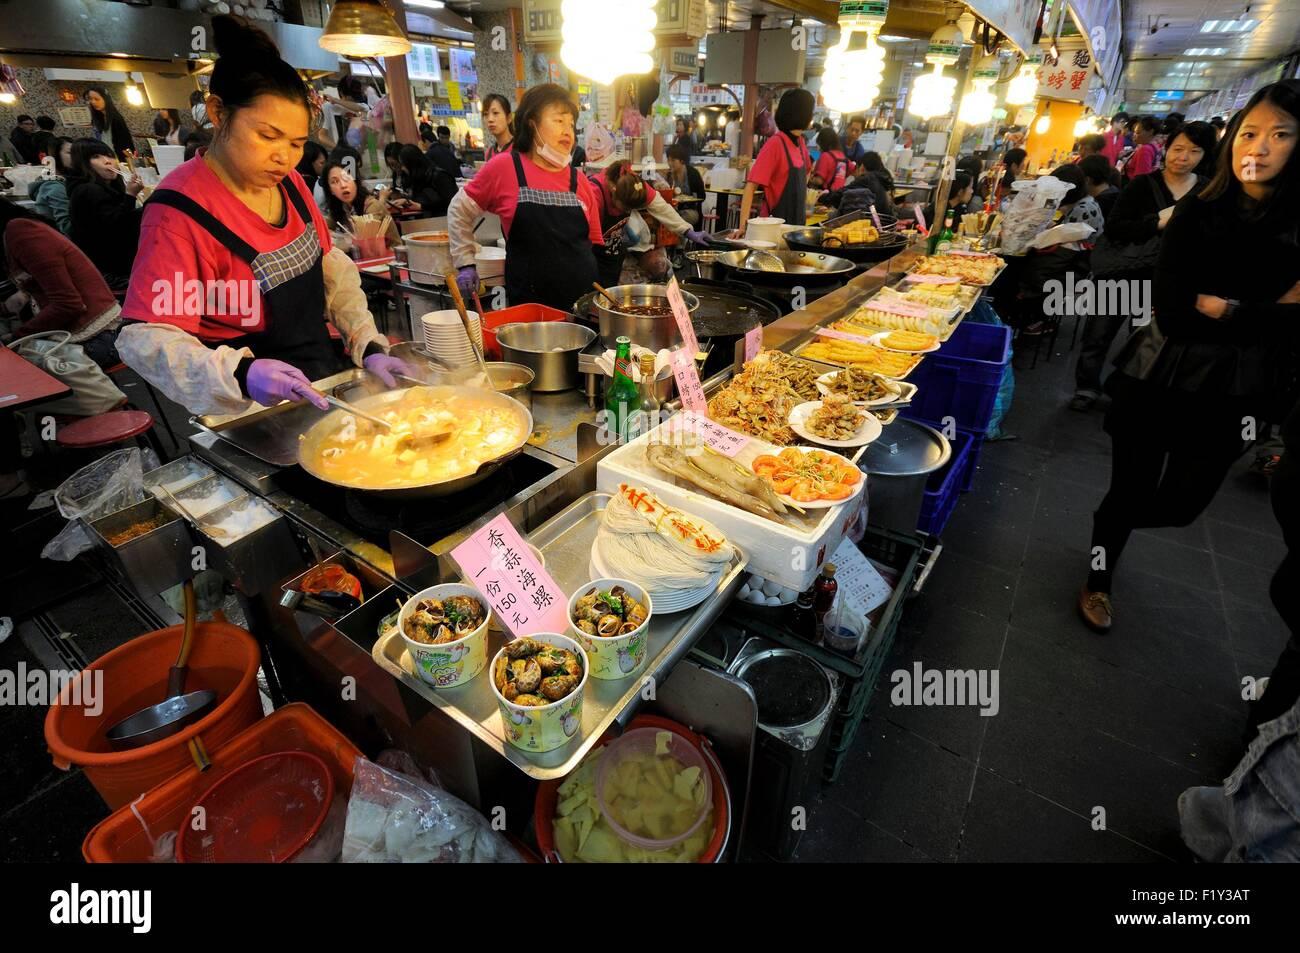 Taiwan, Taipei, distretto di Datong, Dadaocheng, Dihua Street, food court e ristoranti nel grande Shilin night market Immagini Stock